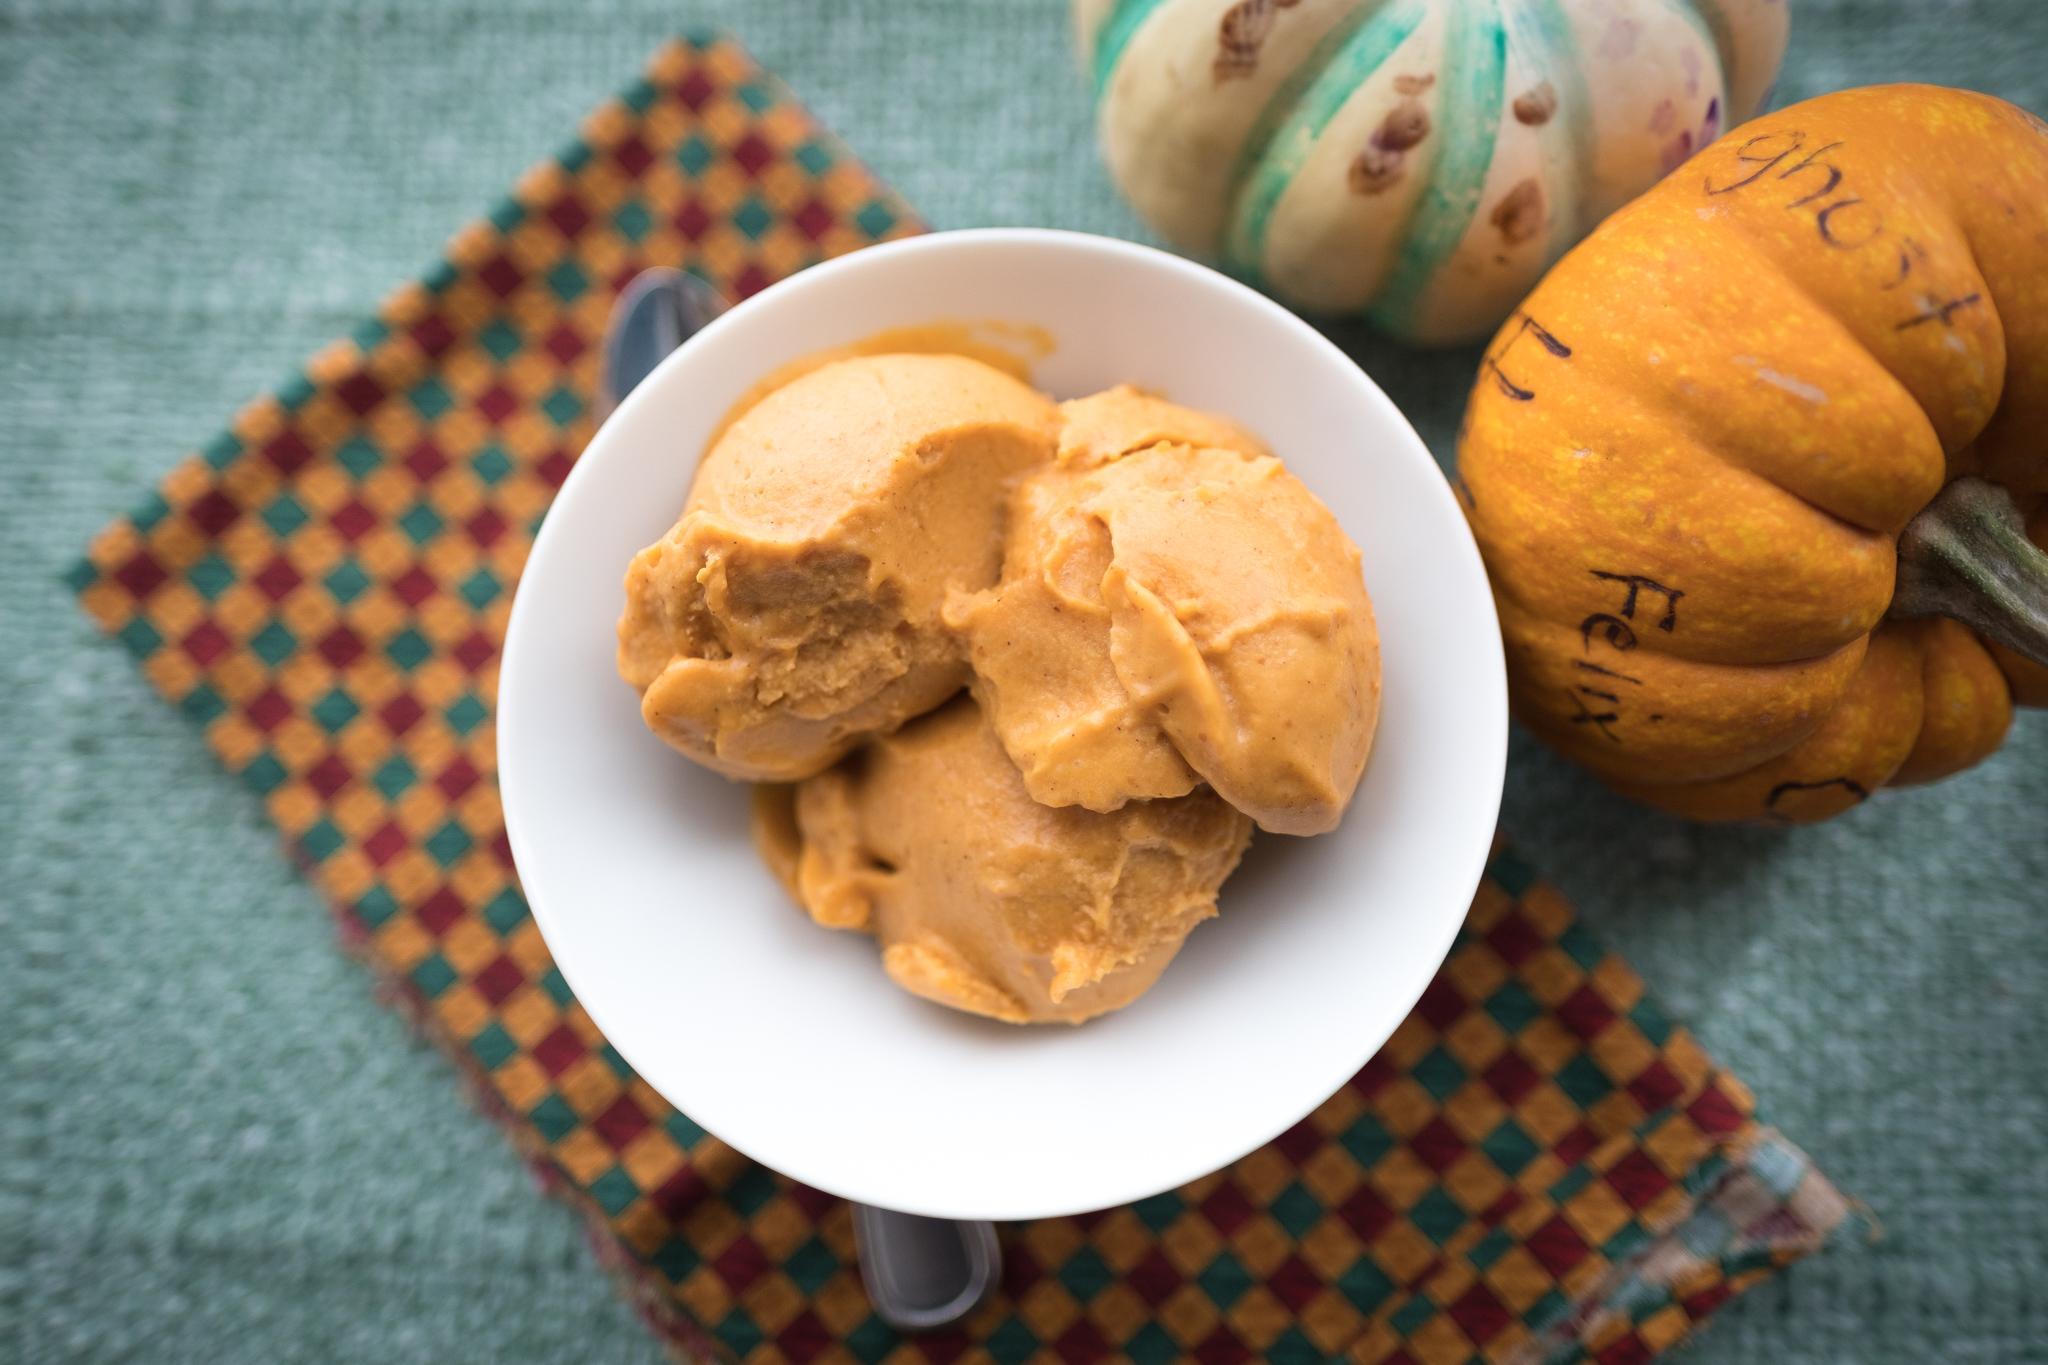 Pumpkin icecream-3.jpg